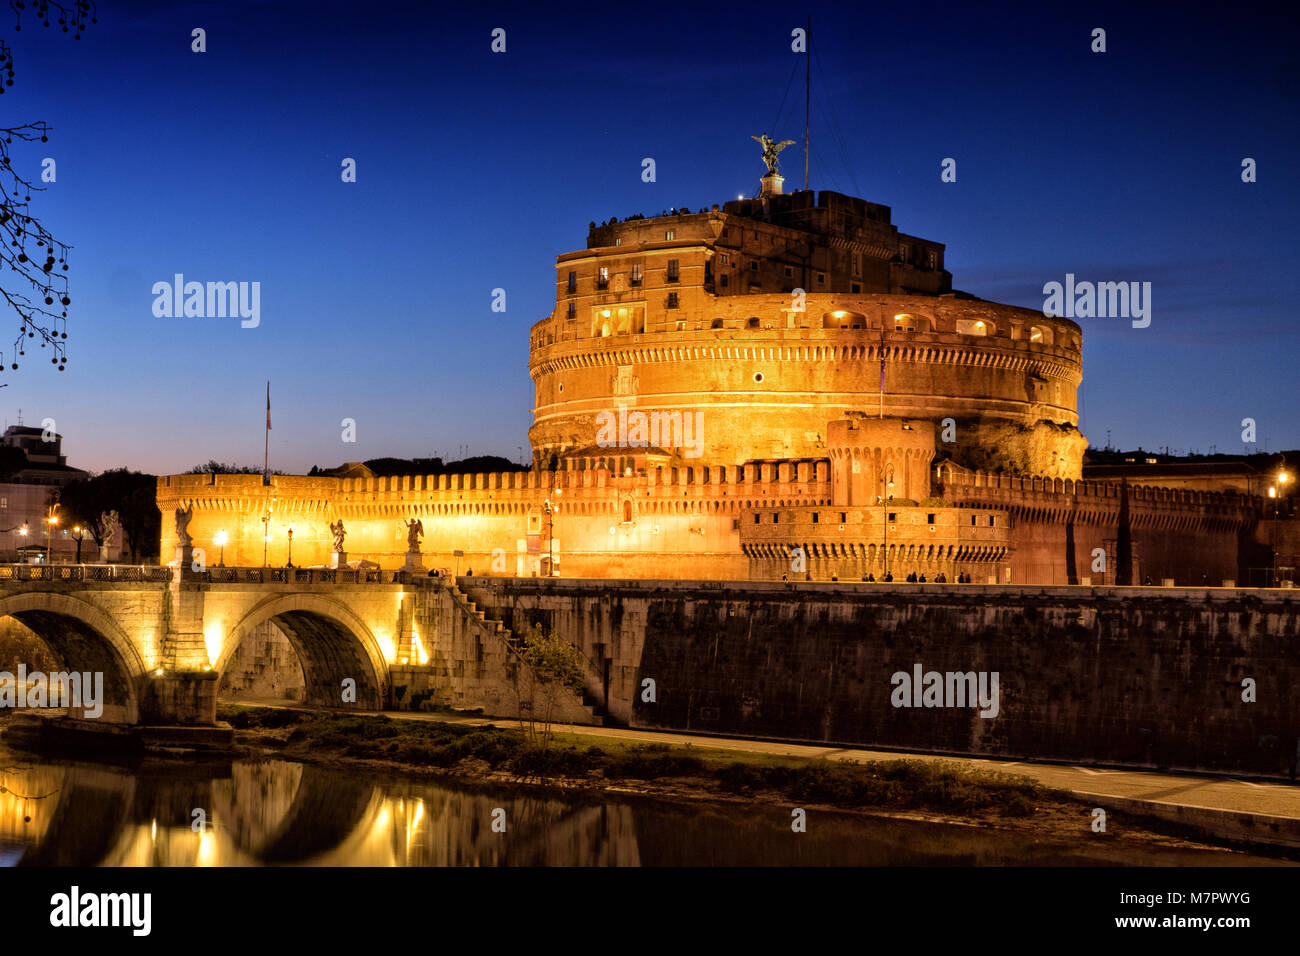 Rome Sant' Angelo Castle and Saint Angelo Bridge by night - Stock Image